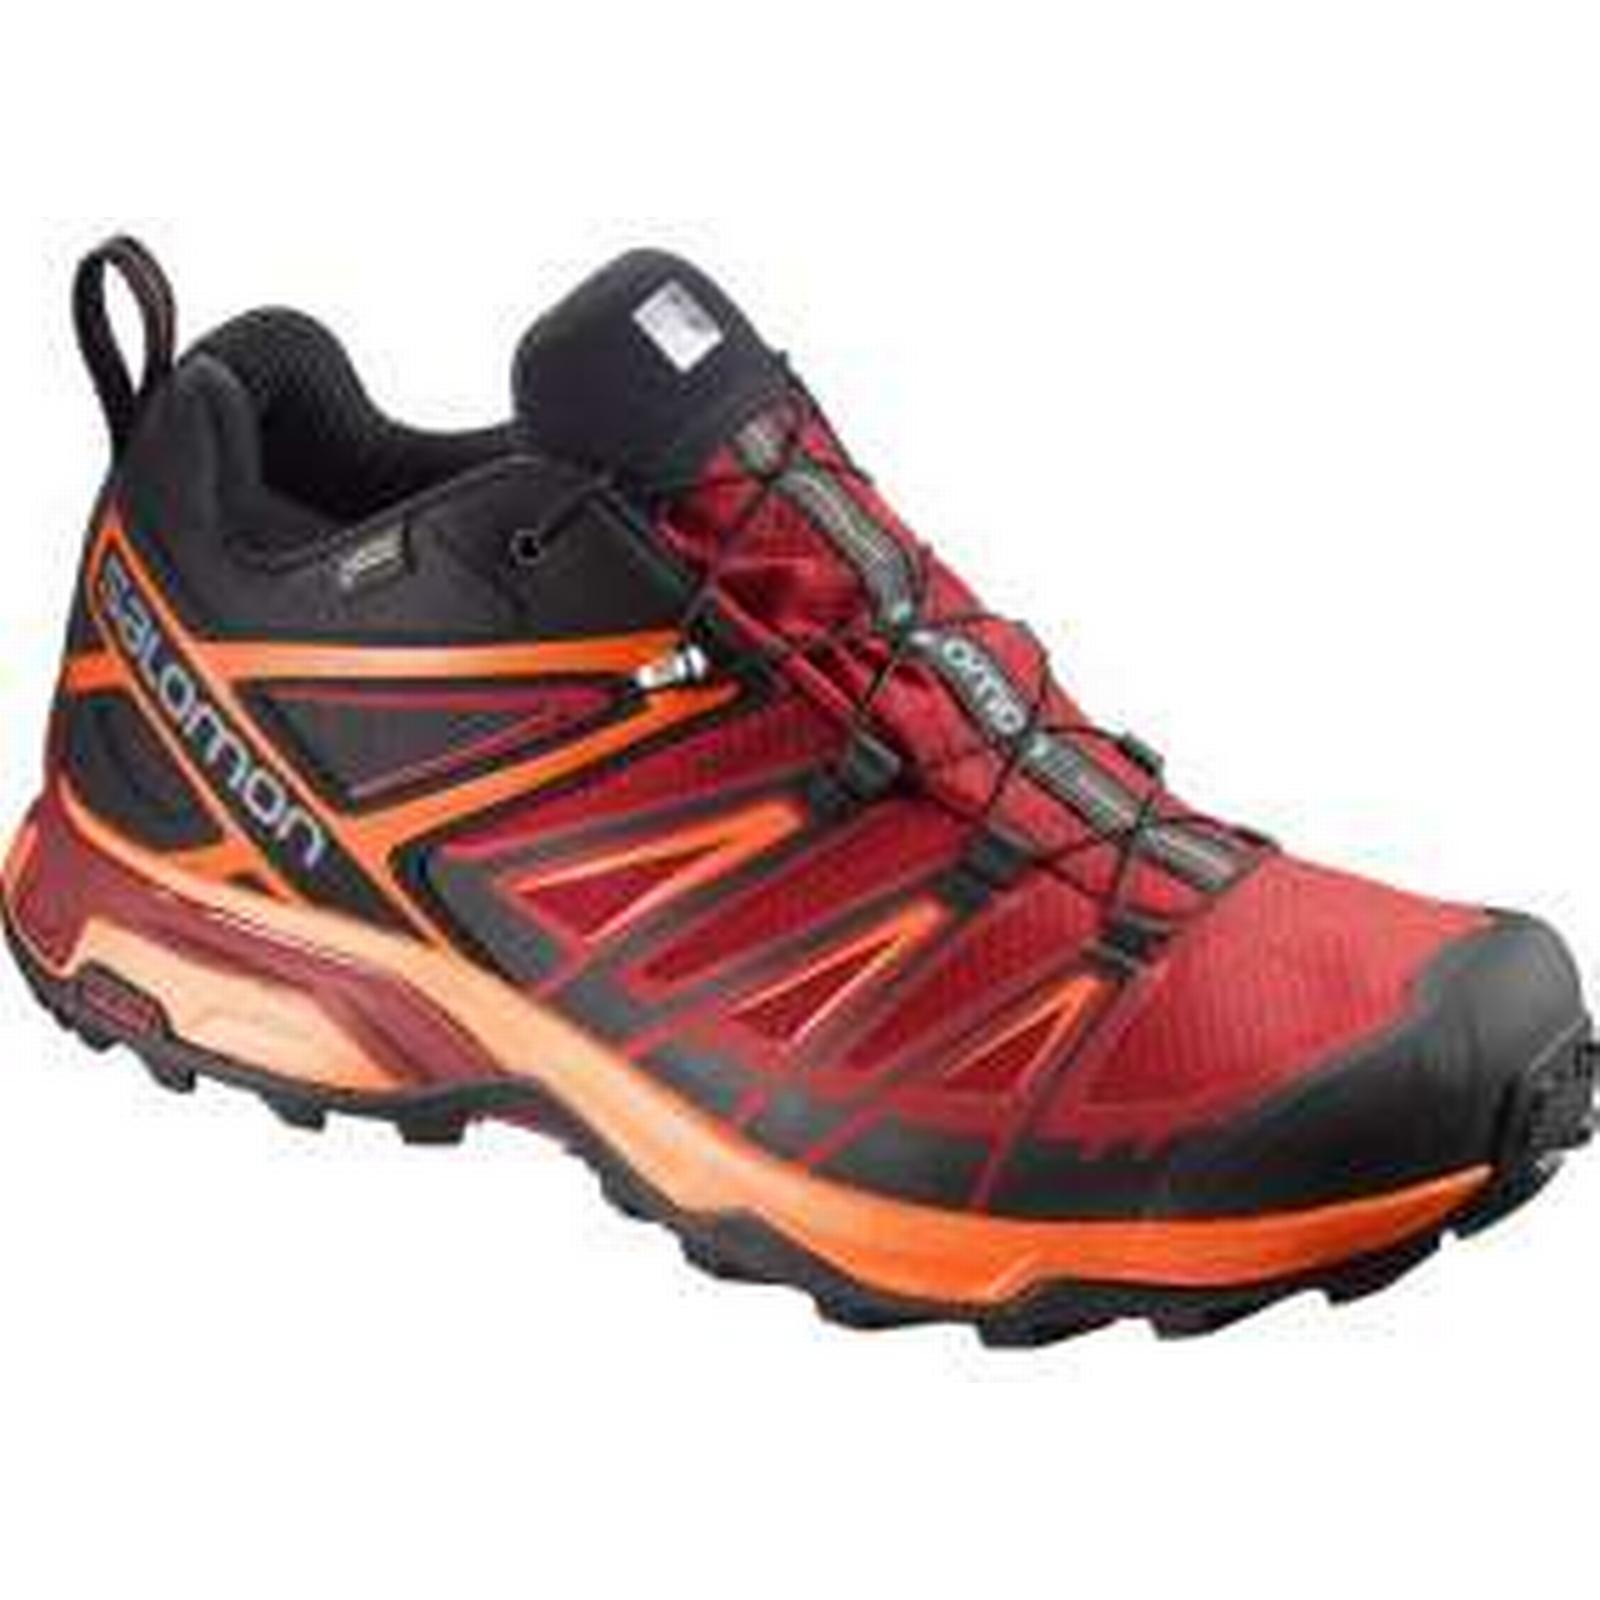 best authentic 2b220 e8edc Mens X-Ultra 3 3 3 GTX Shoe 4e3cde